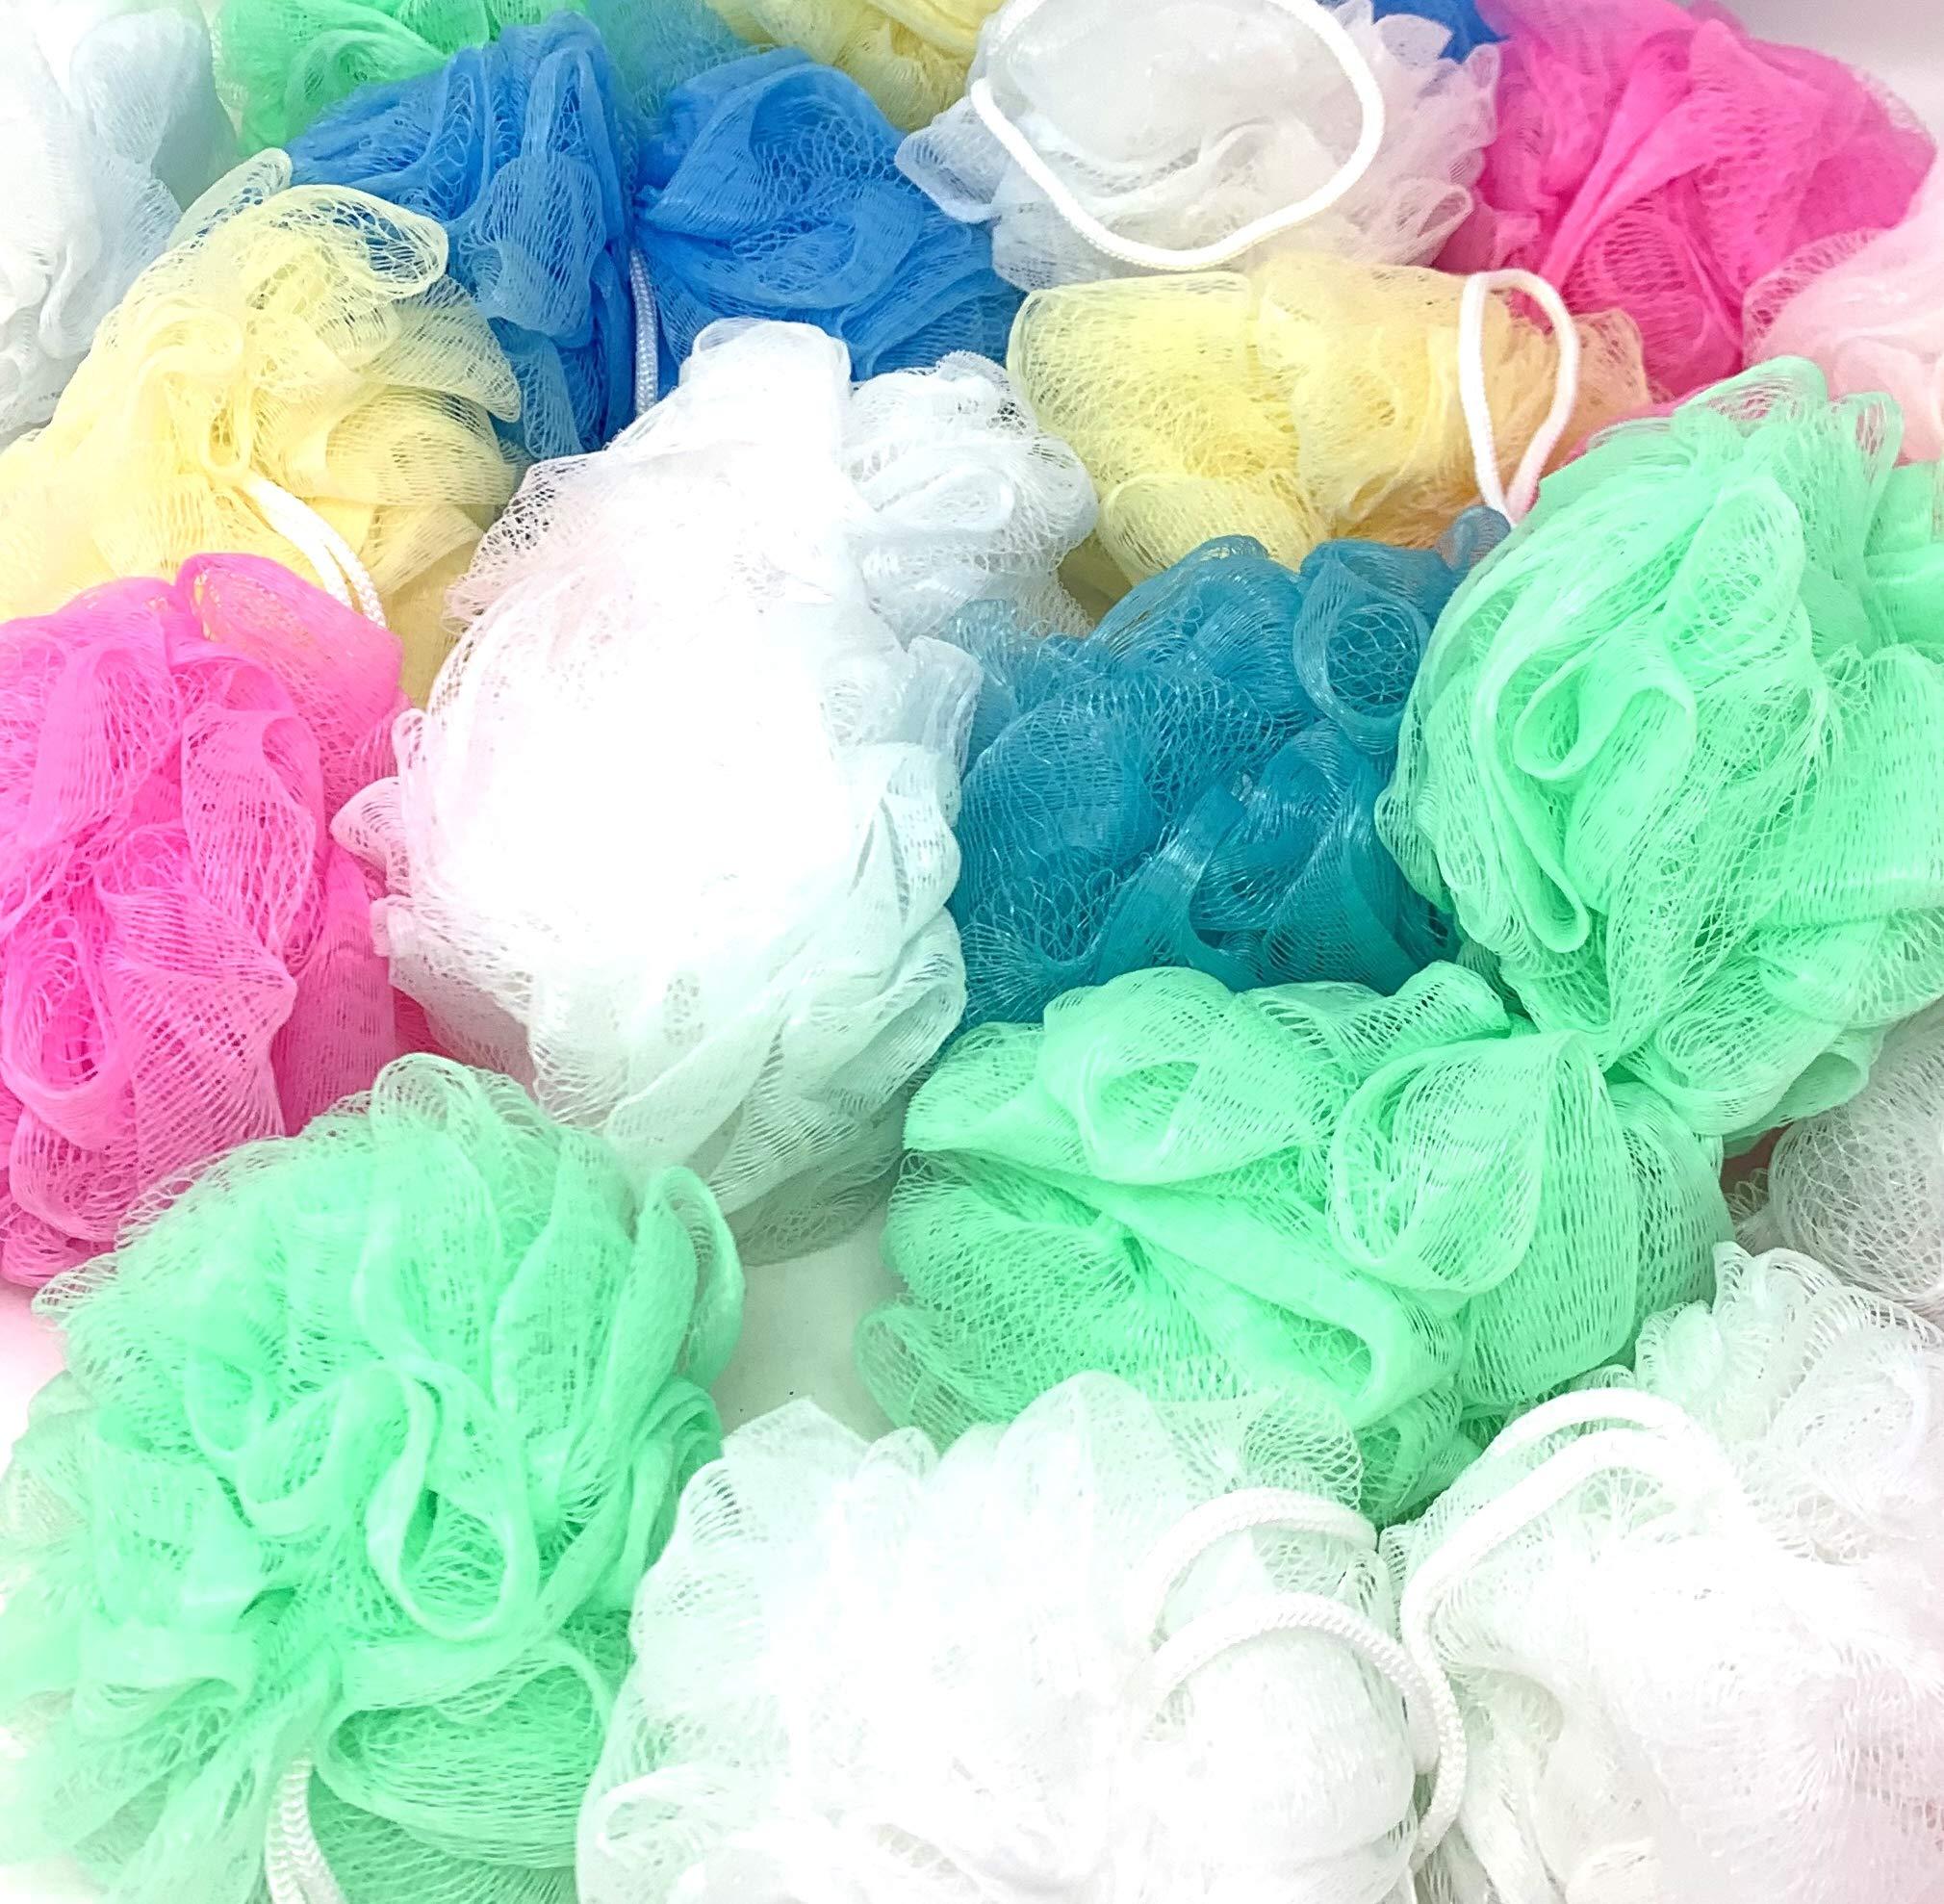 48 Bath or Shower Sponge Loofahs Pouf Mesh Assorted Colors WHOLESALE BULK LOT by Loofah Lord